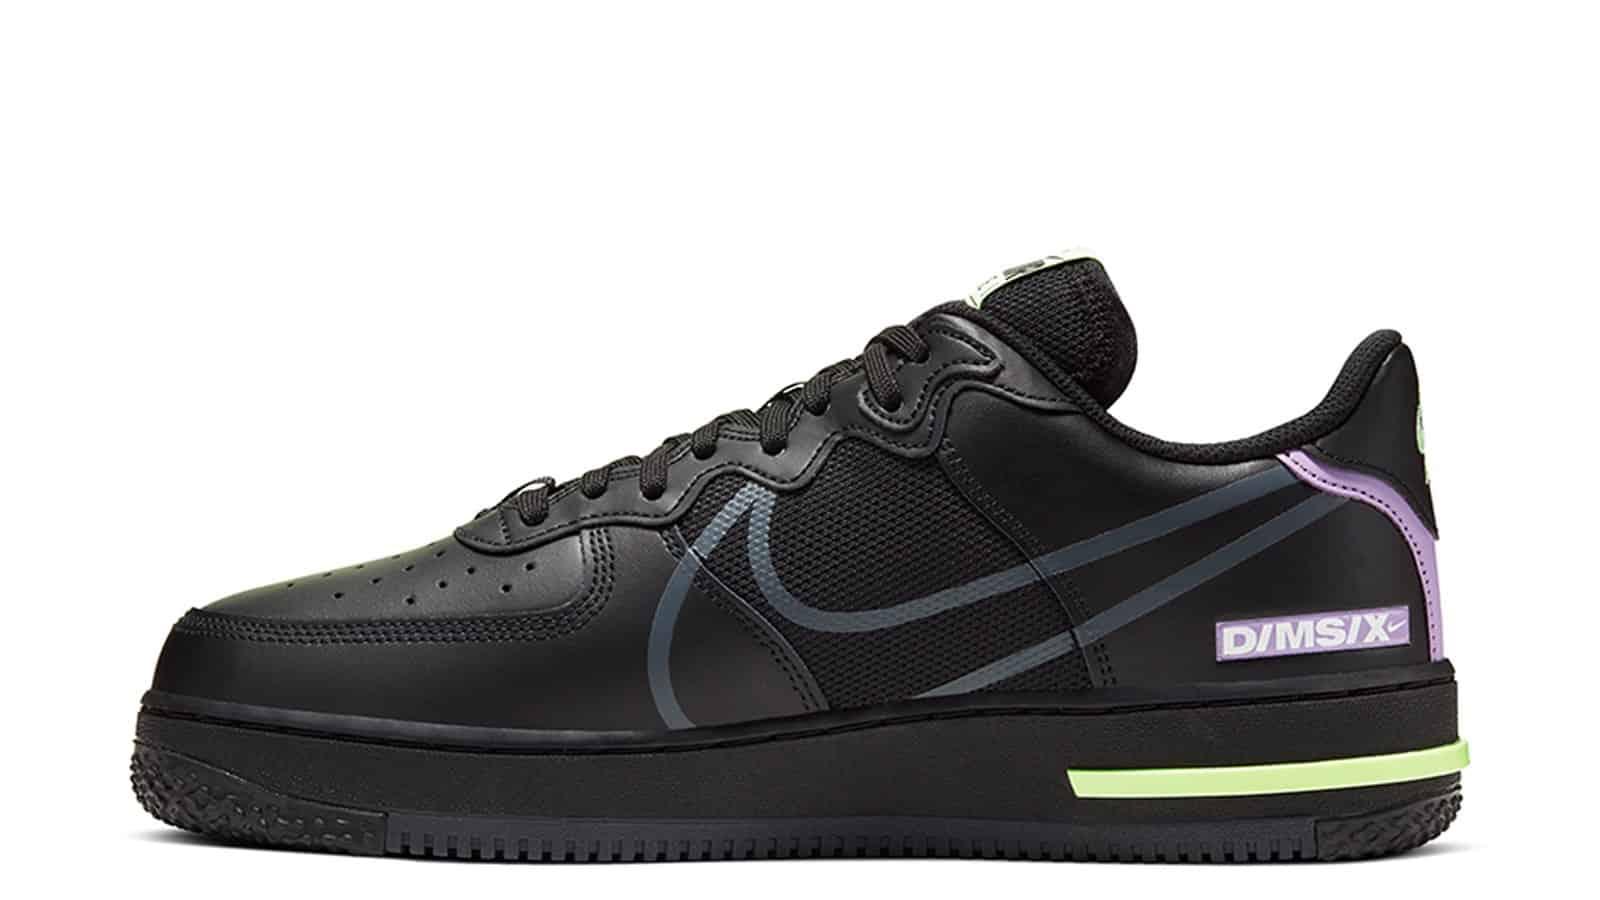 Nike Air Force 1 D MS X Black